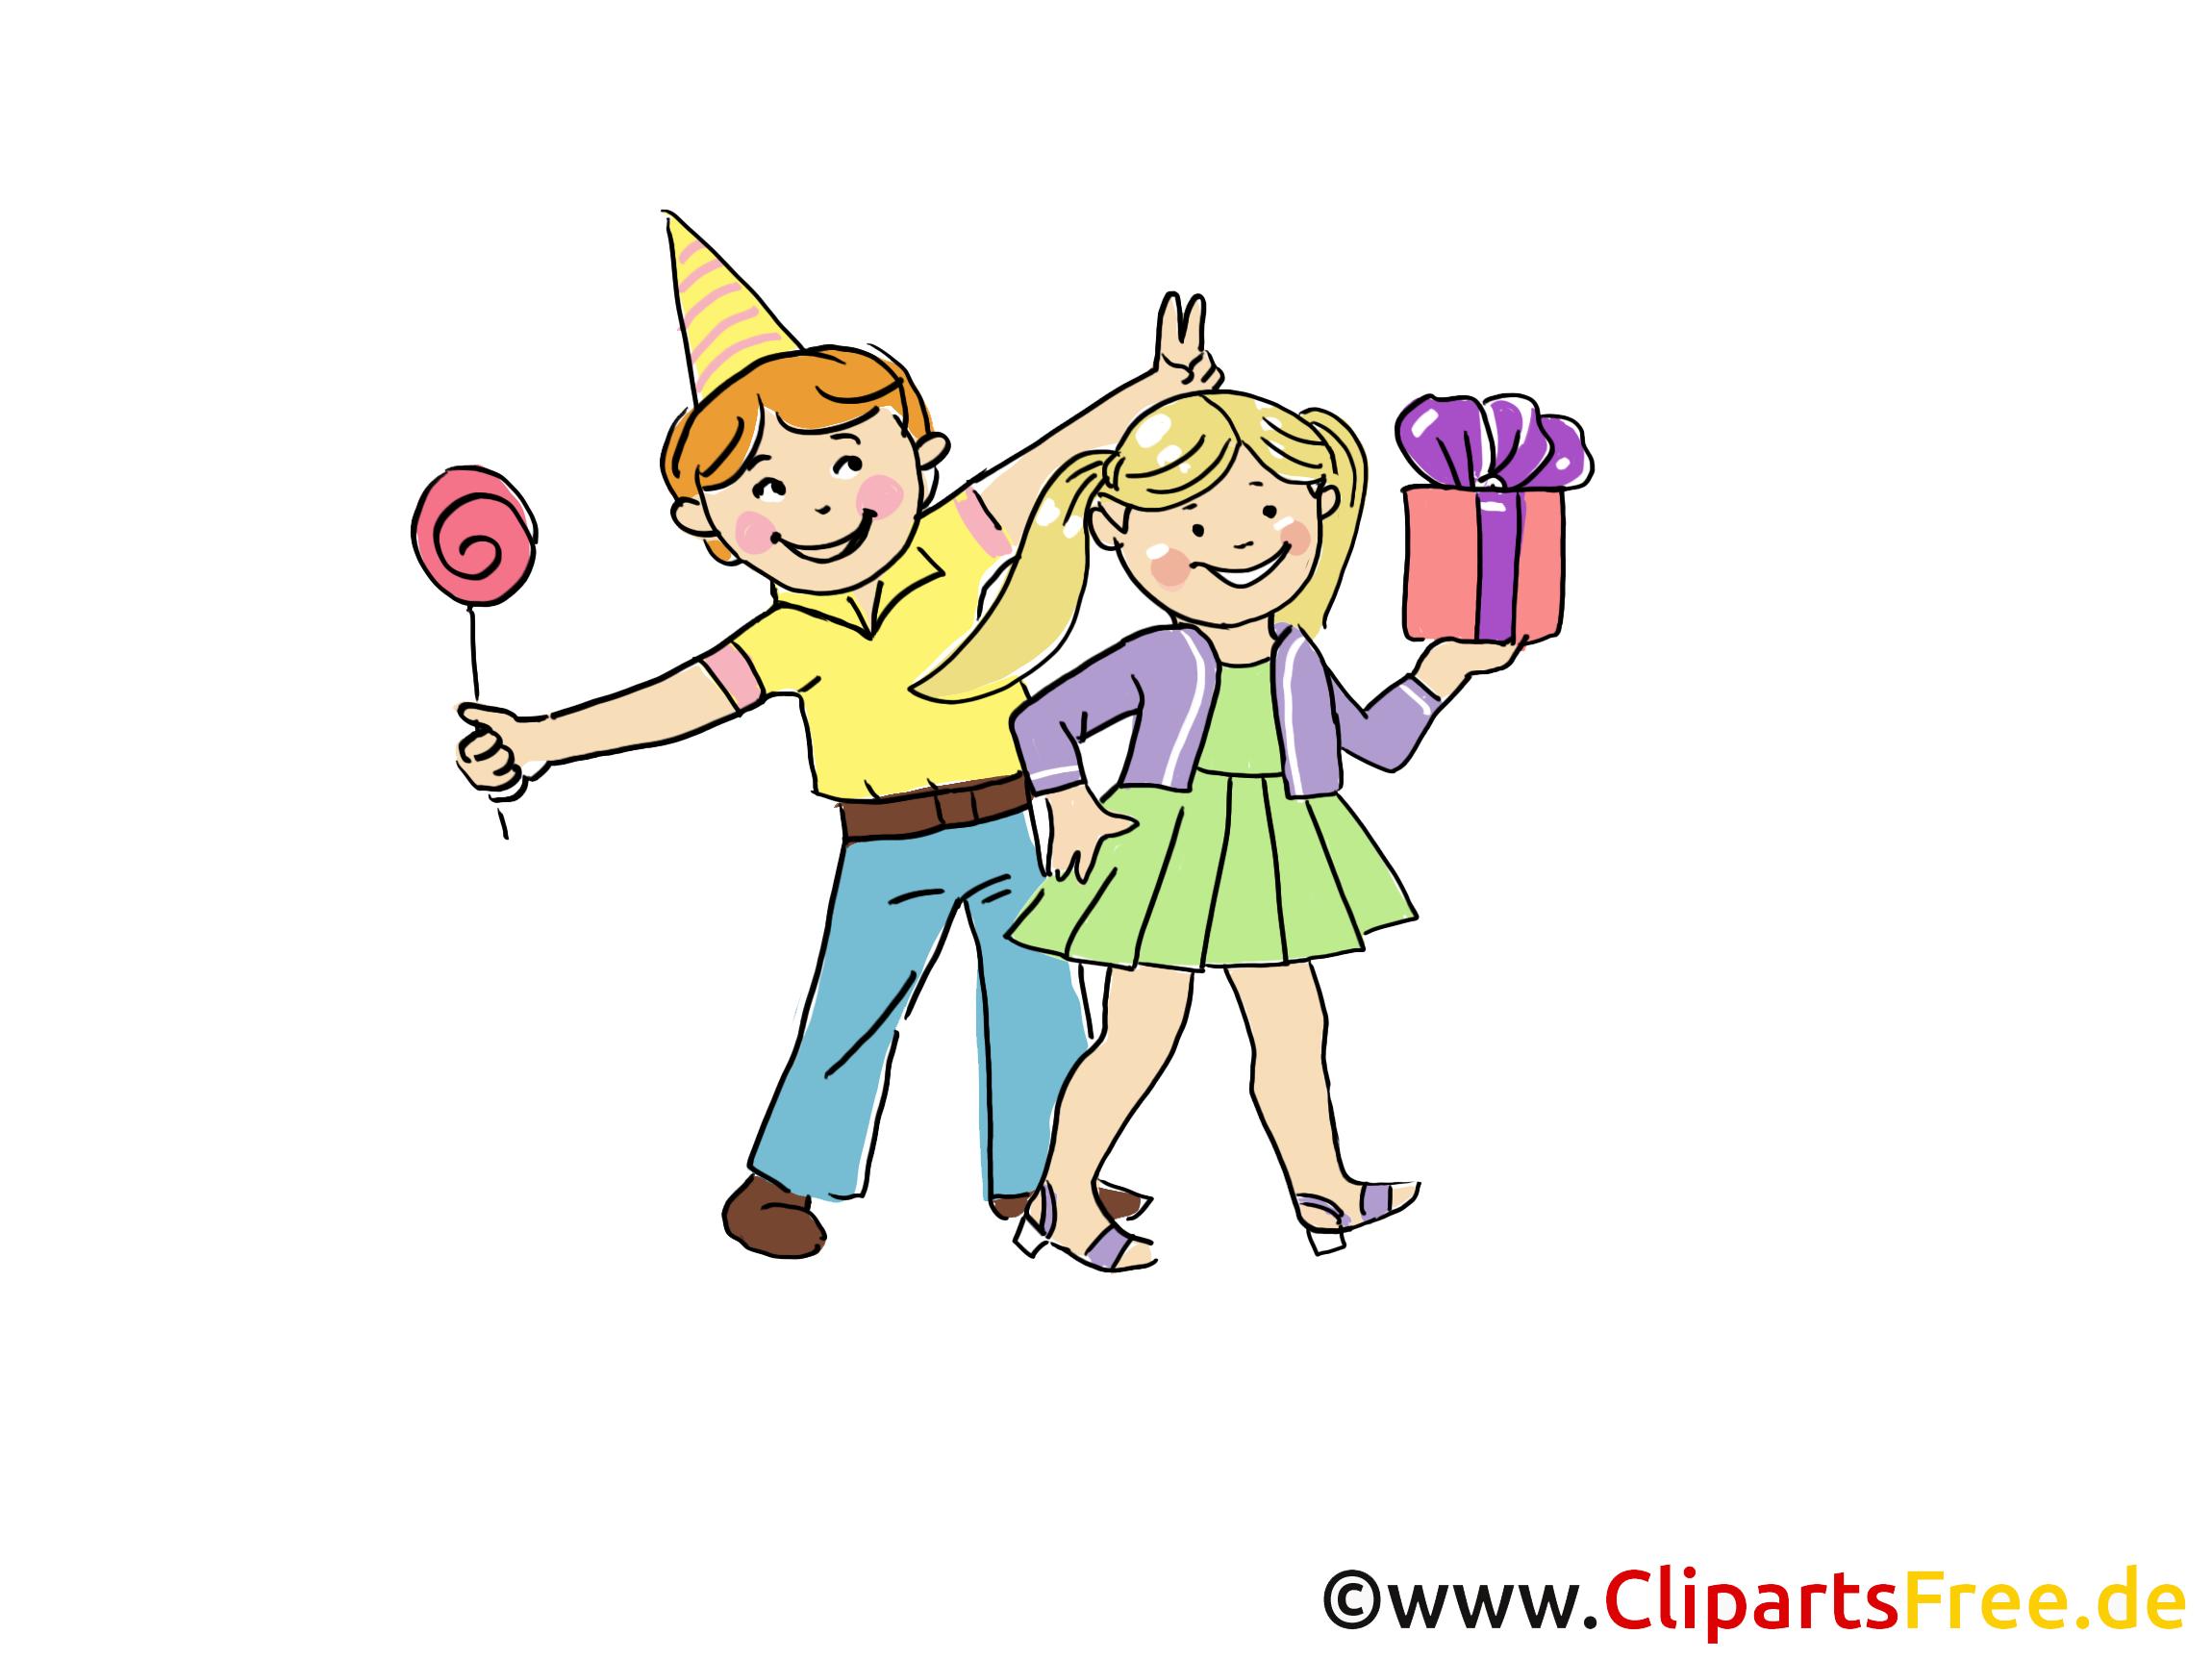 Clipart feiern kostenlos image free stock Party Bilder, Cliparts, Cartoons, Grafiken, Illustrationen, Gifs ... image free stock